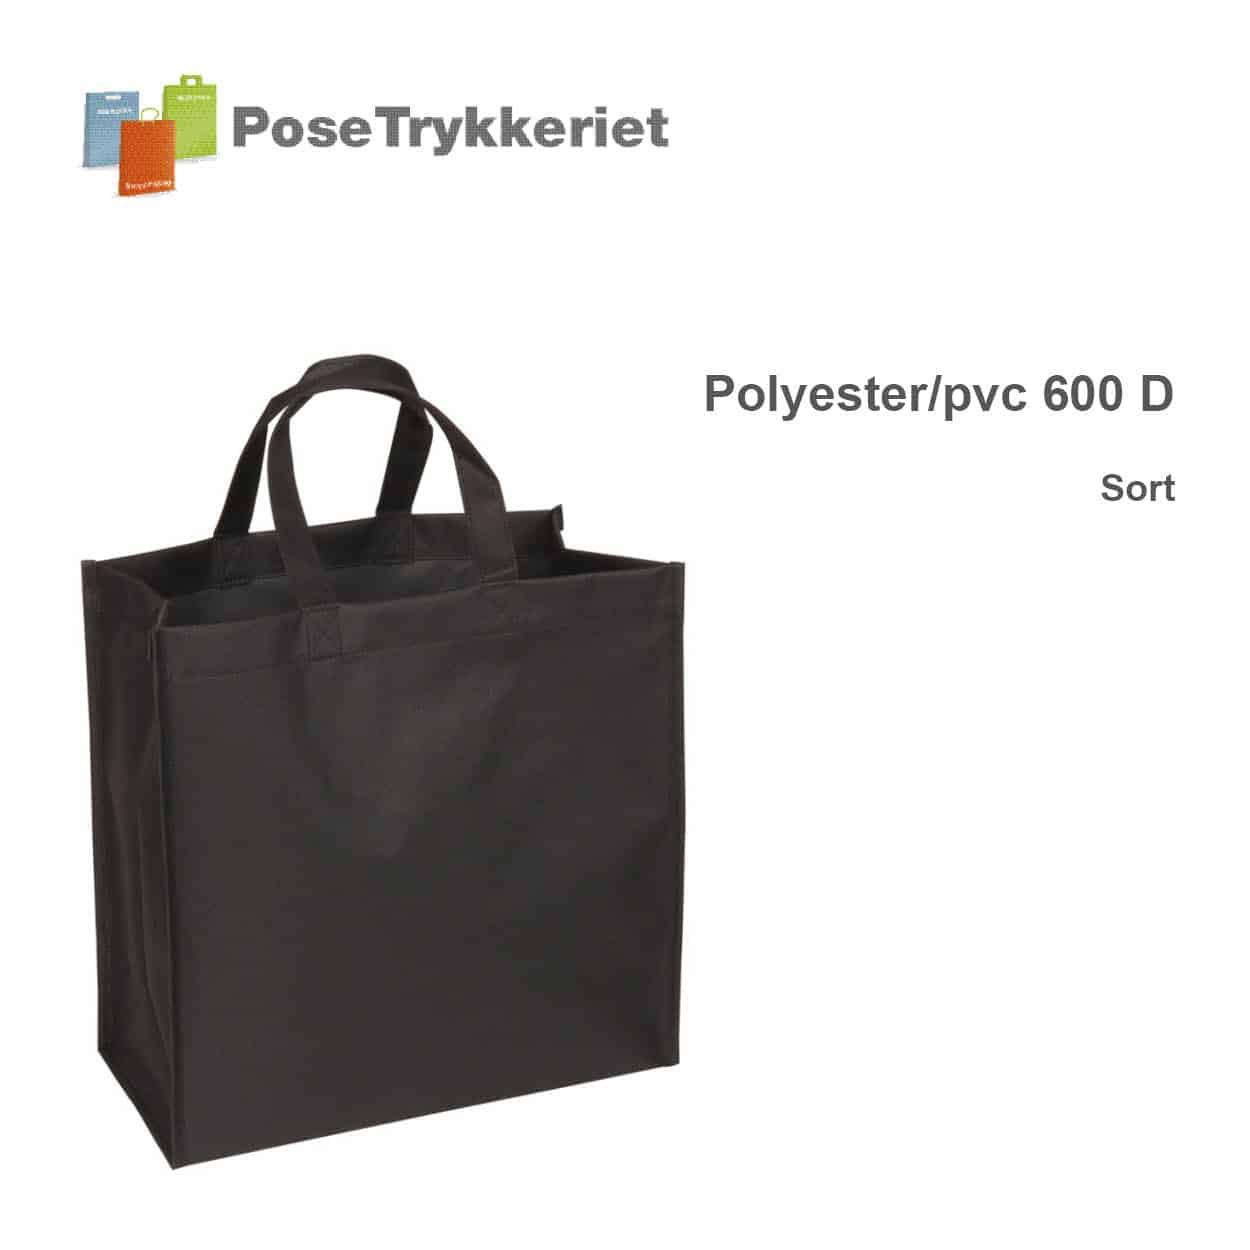 Sort revisorpose 600 D. PoseTrykkeriet.dk